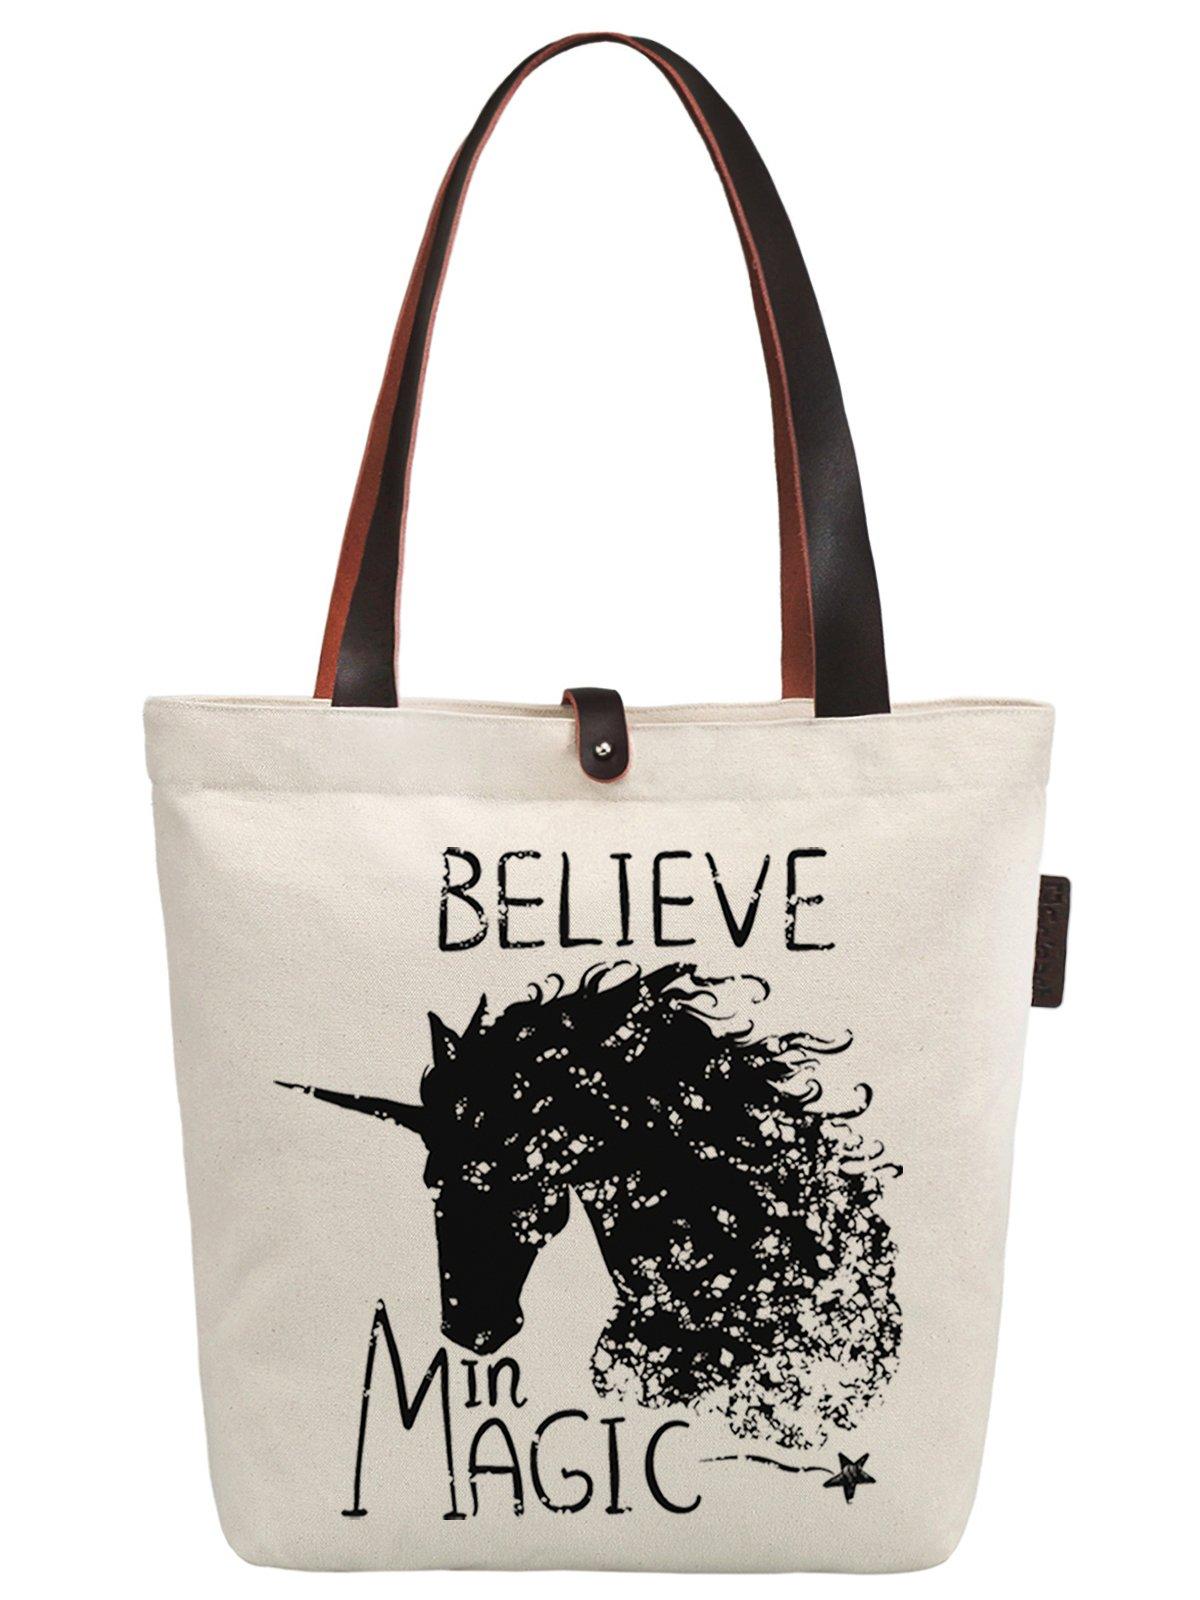 So'each Women's Believe Magic Unicorn Graphic Canvas Handbag Tote Shoulder Bag